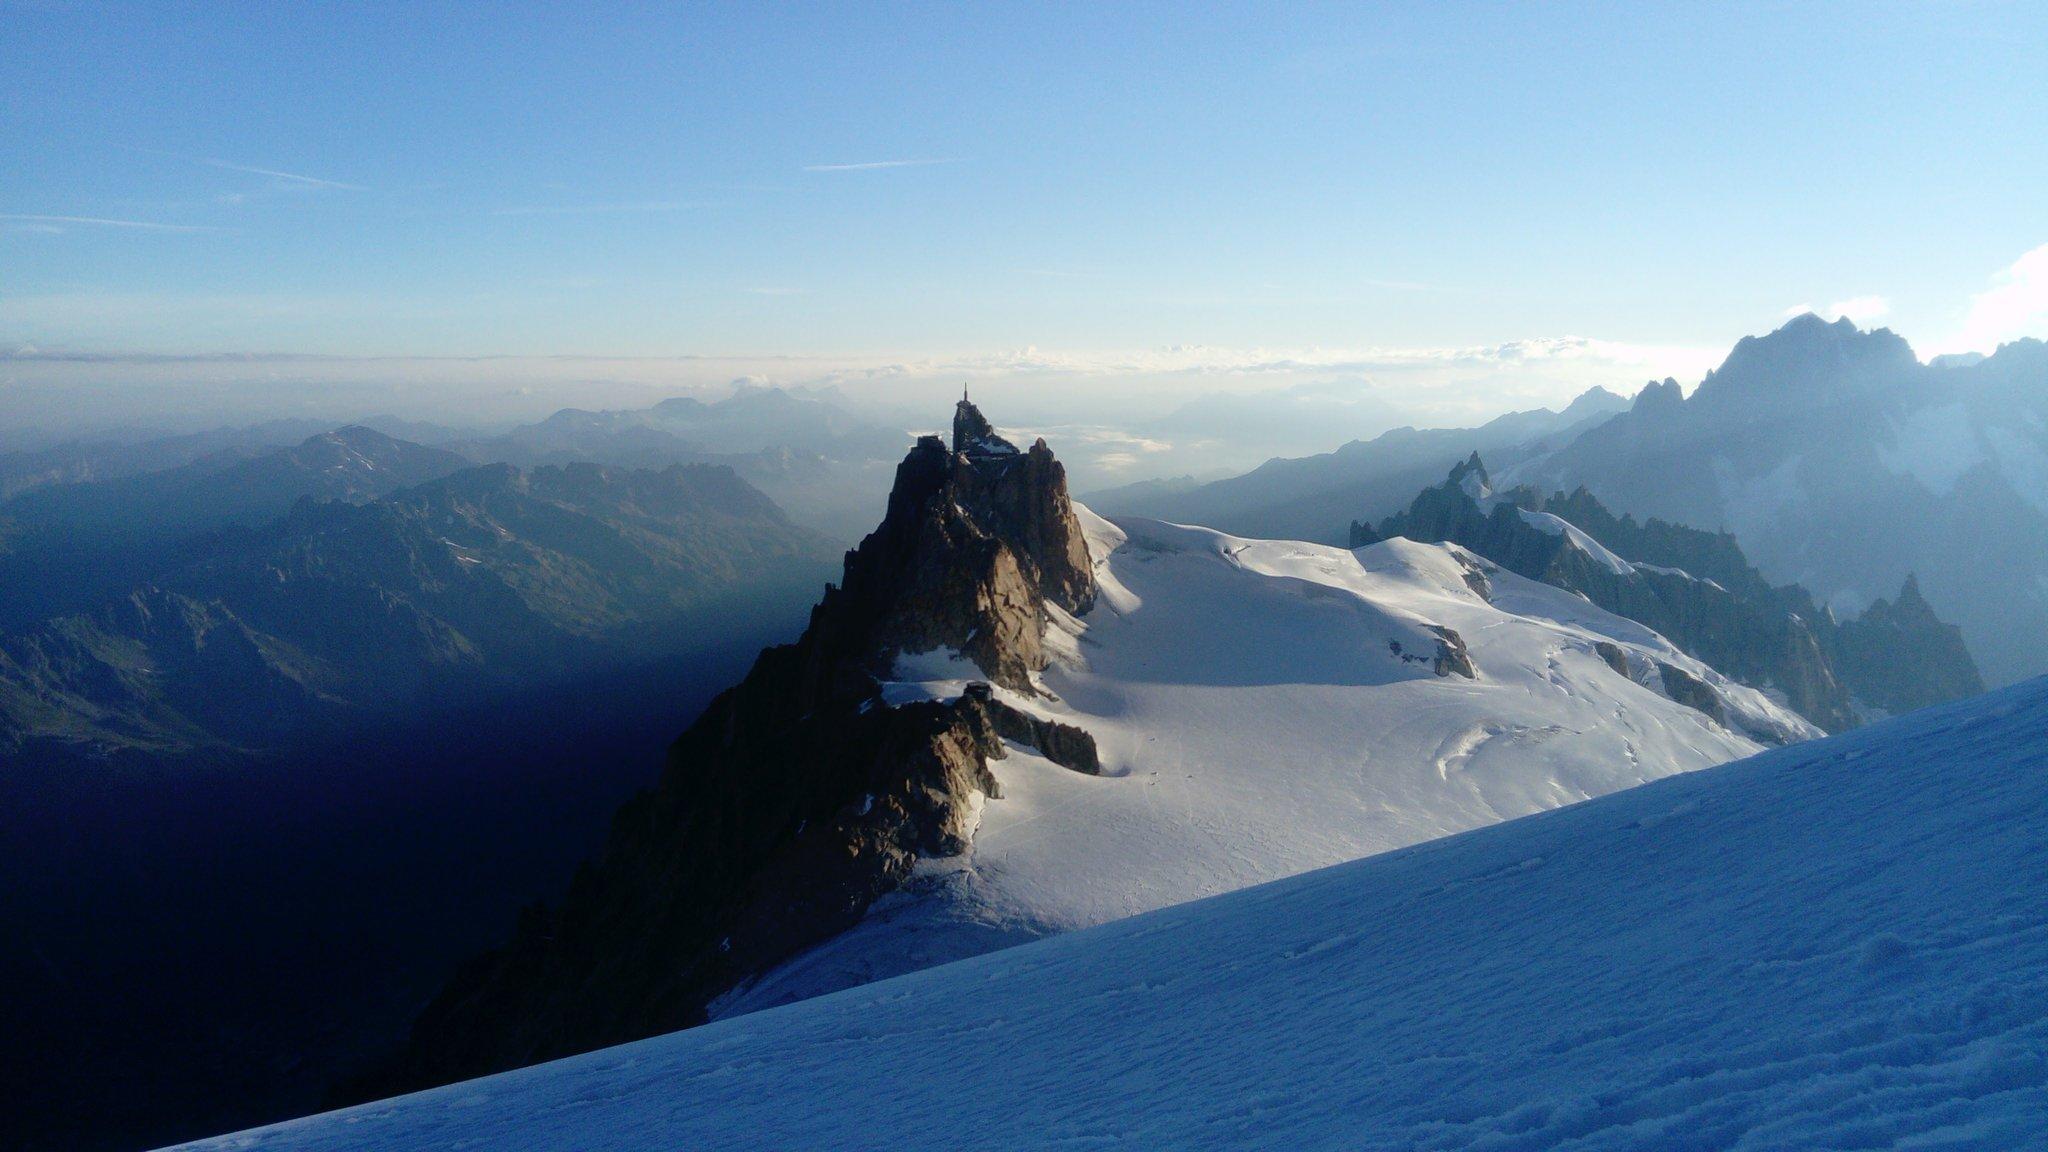 The Aiguille du Midi from the shoulder of Mont Blanc du Tacul